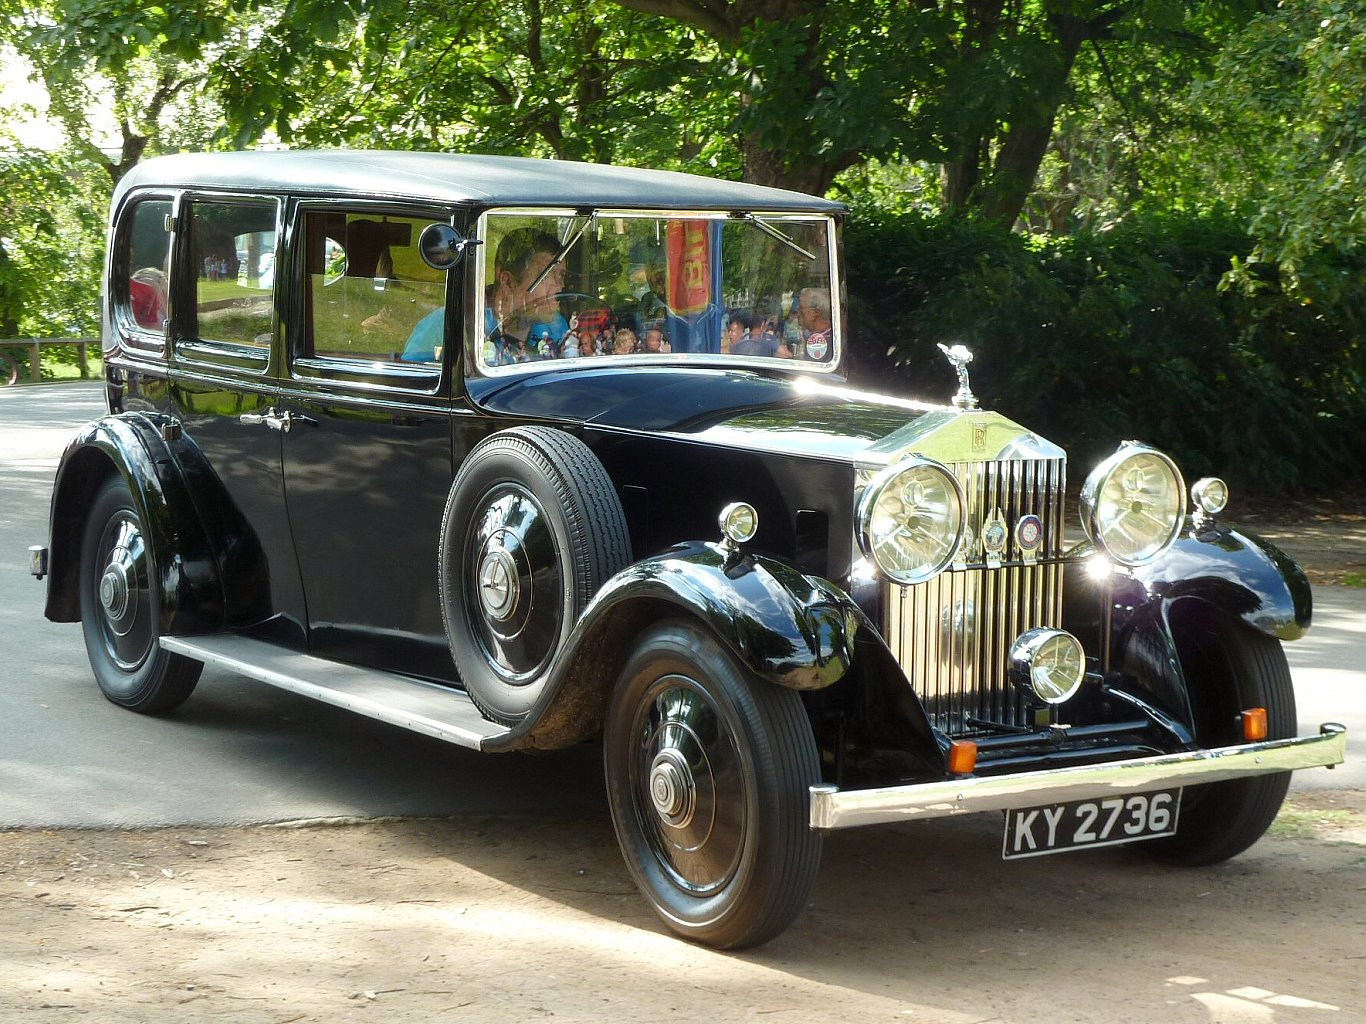 Filerolls Royce 20 25 Rippon 6 Light Limousine 5904821068 Jaguar Wiring Color Codes